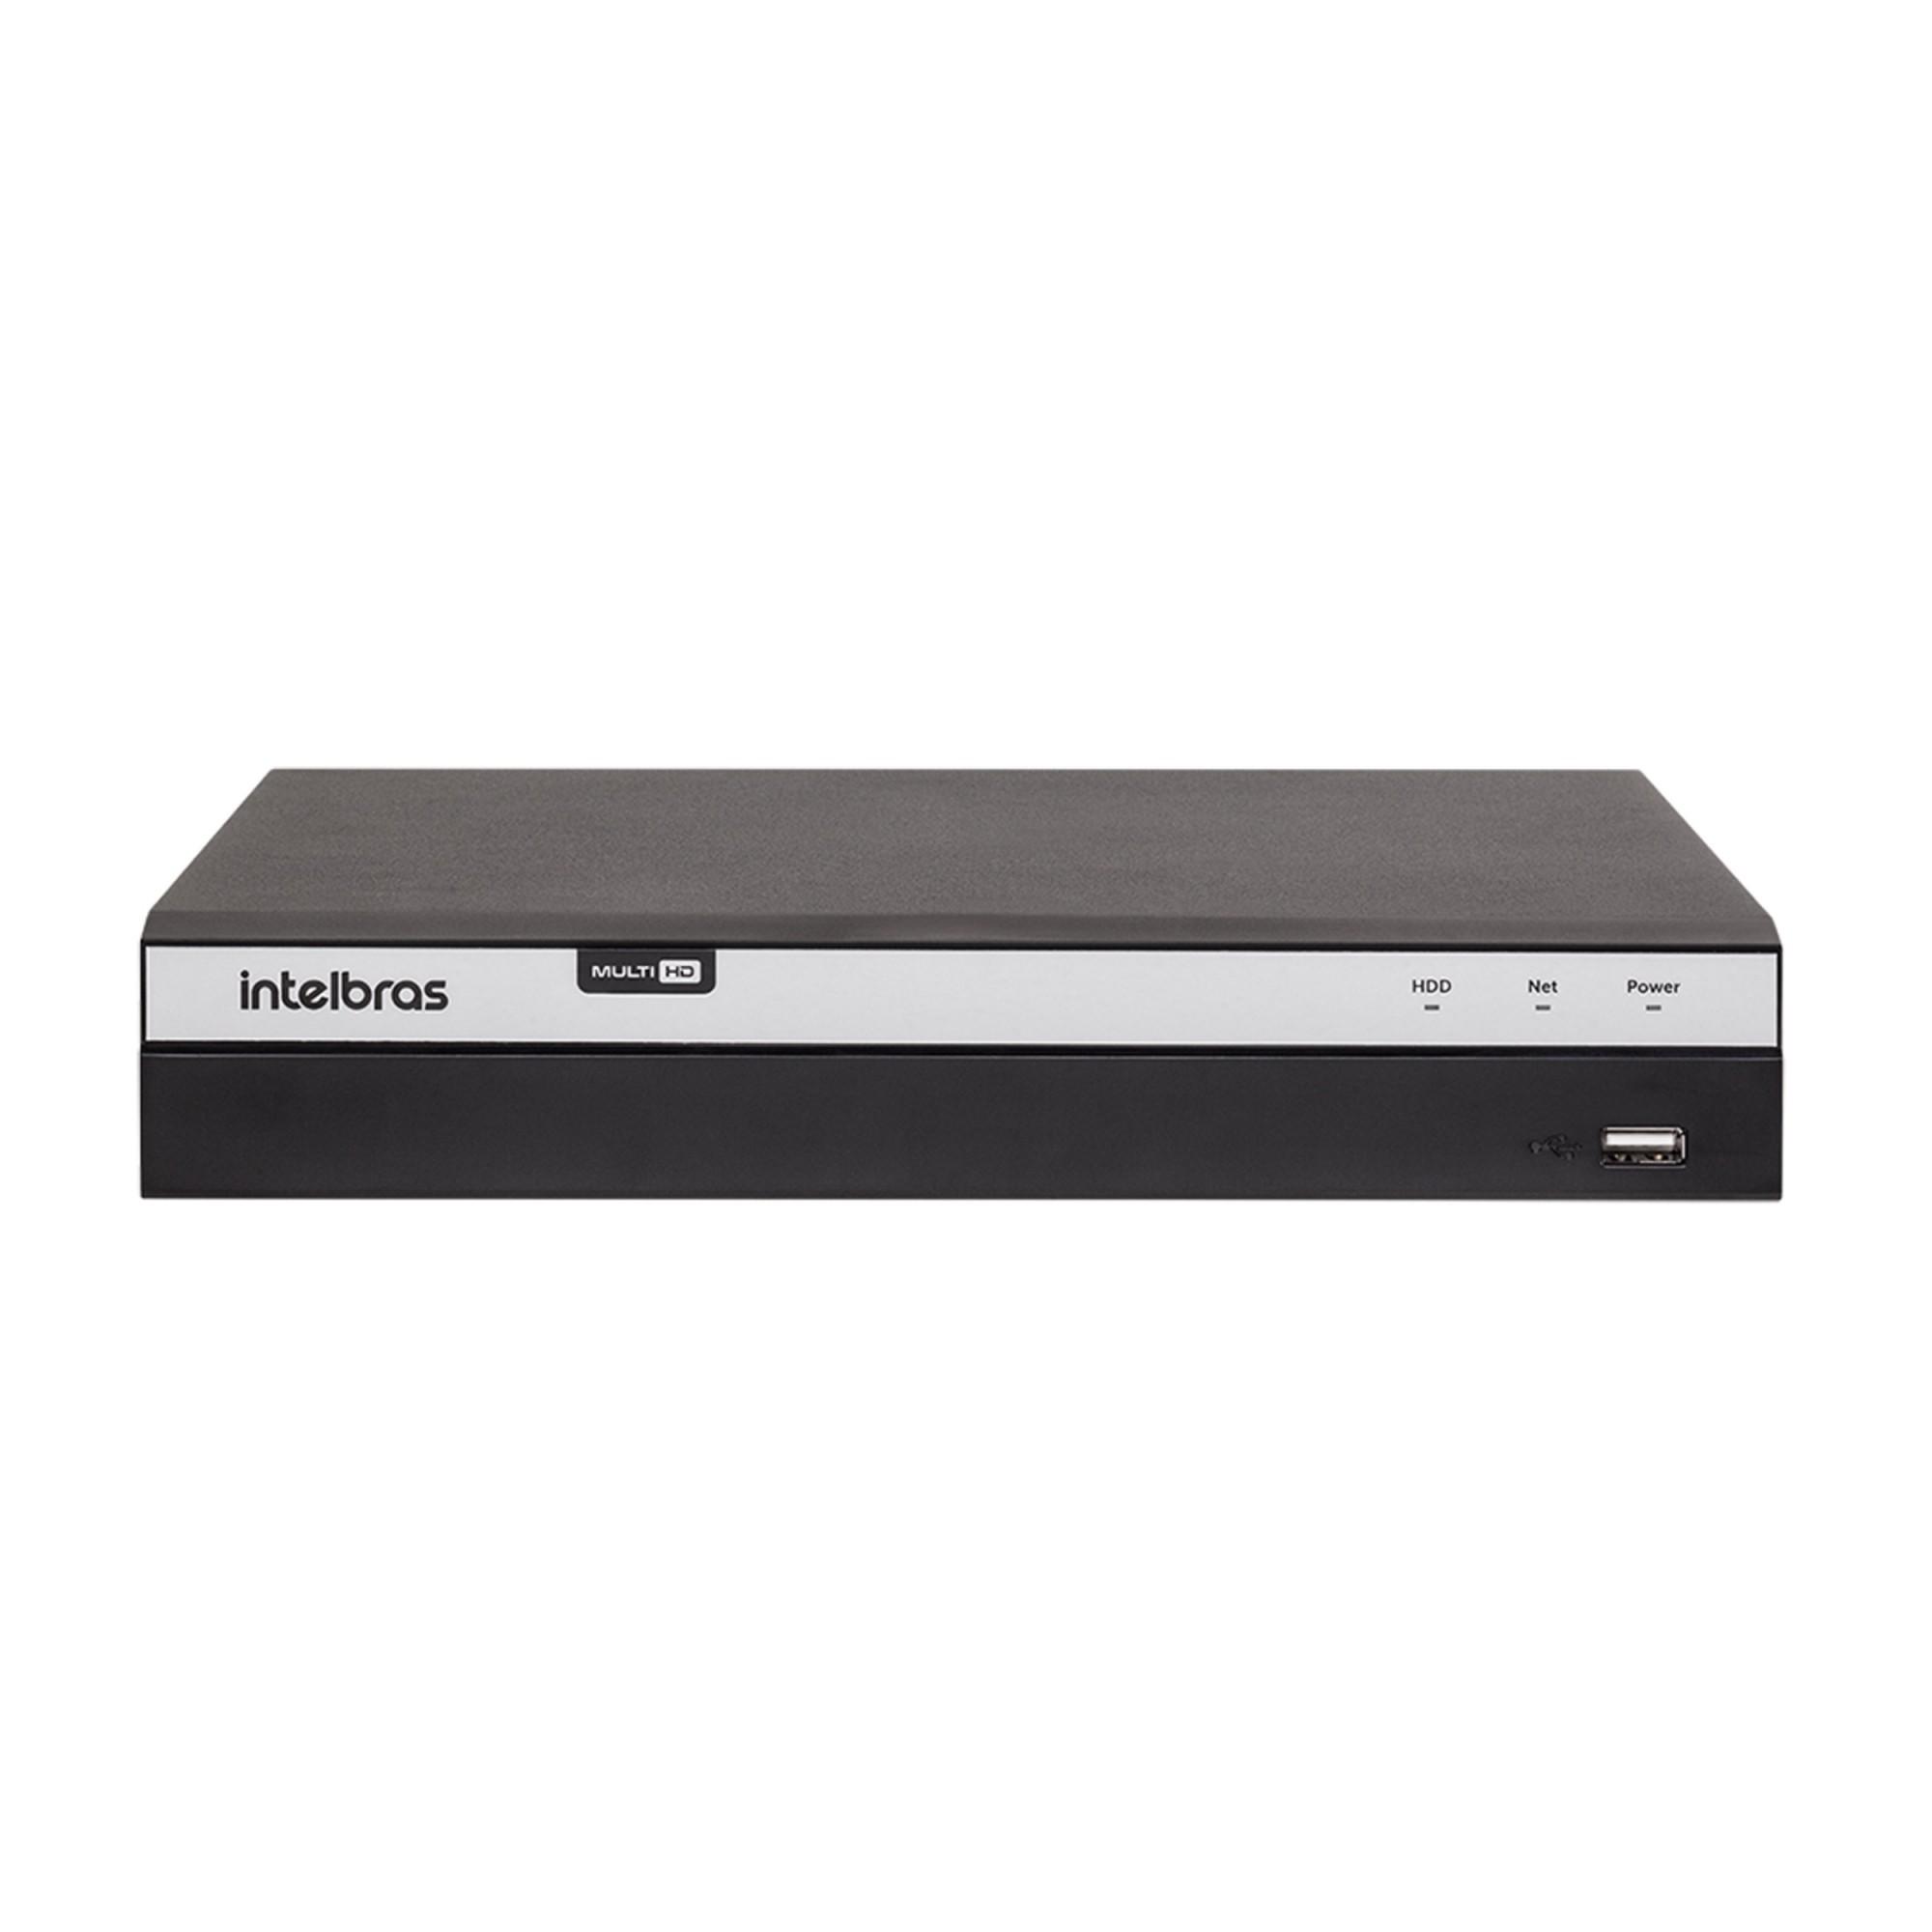 DVR Intelbras 08 canais MHDX 3108 4MP Lite Mult HD 4580331